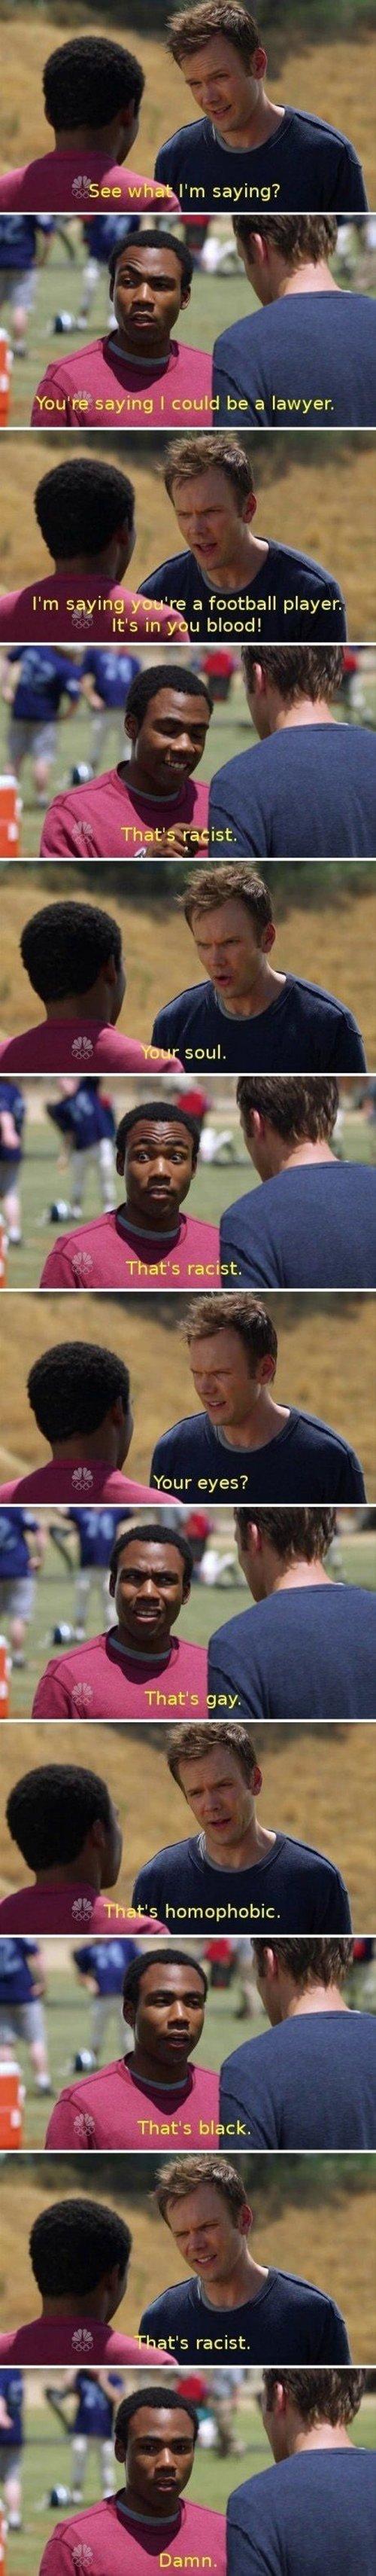 community-racist